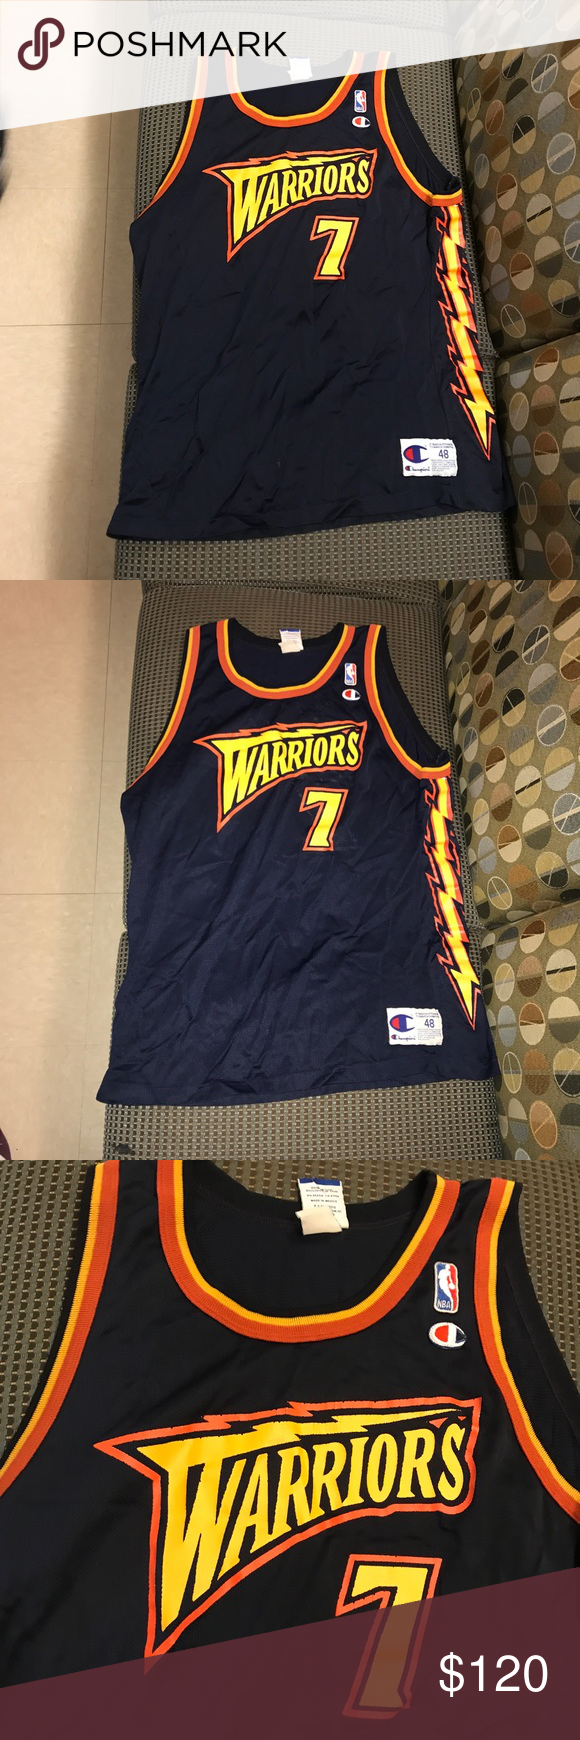 937e7ccc Antawn Jamison Golden State Warriors Jersey Antawn Jamison Golden State  Warriors GSW NBA basketball Champion Jersey